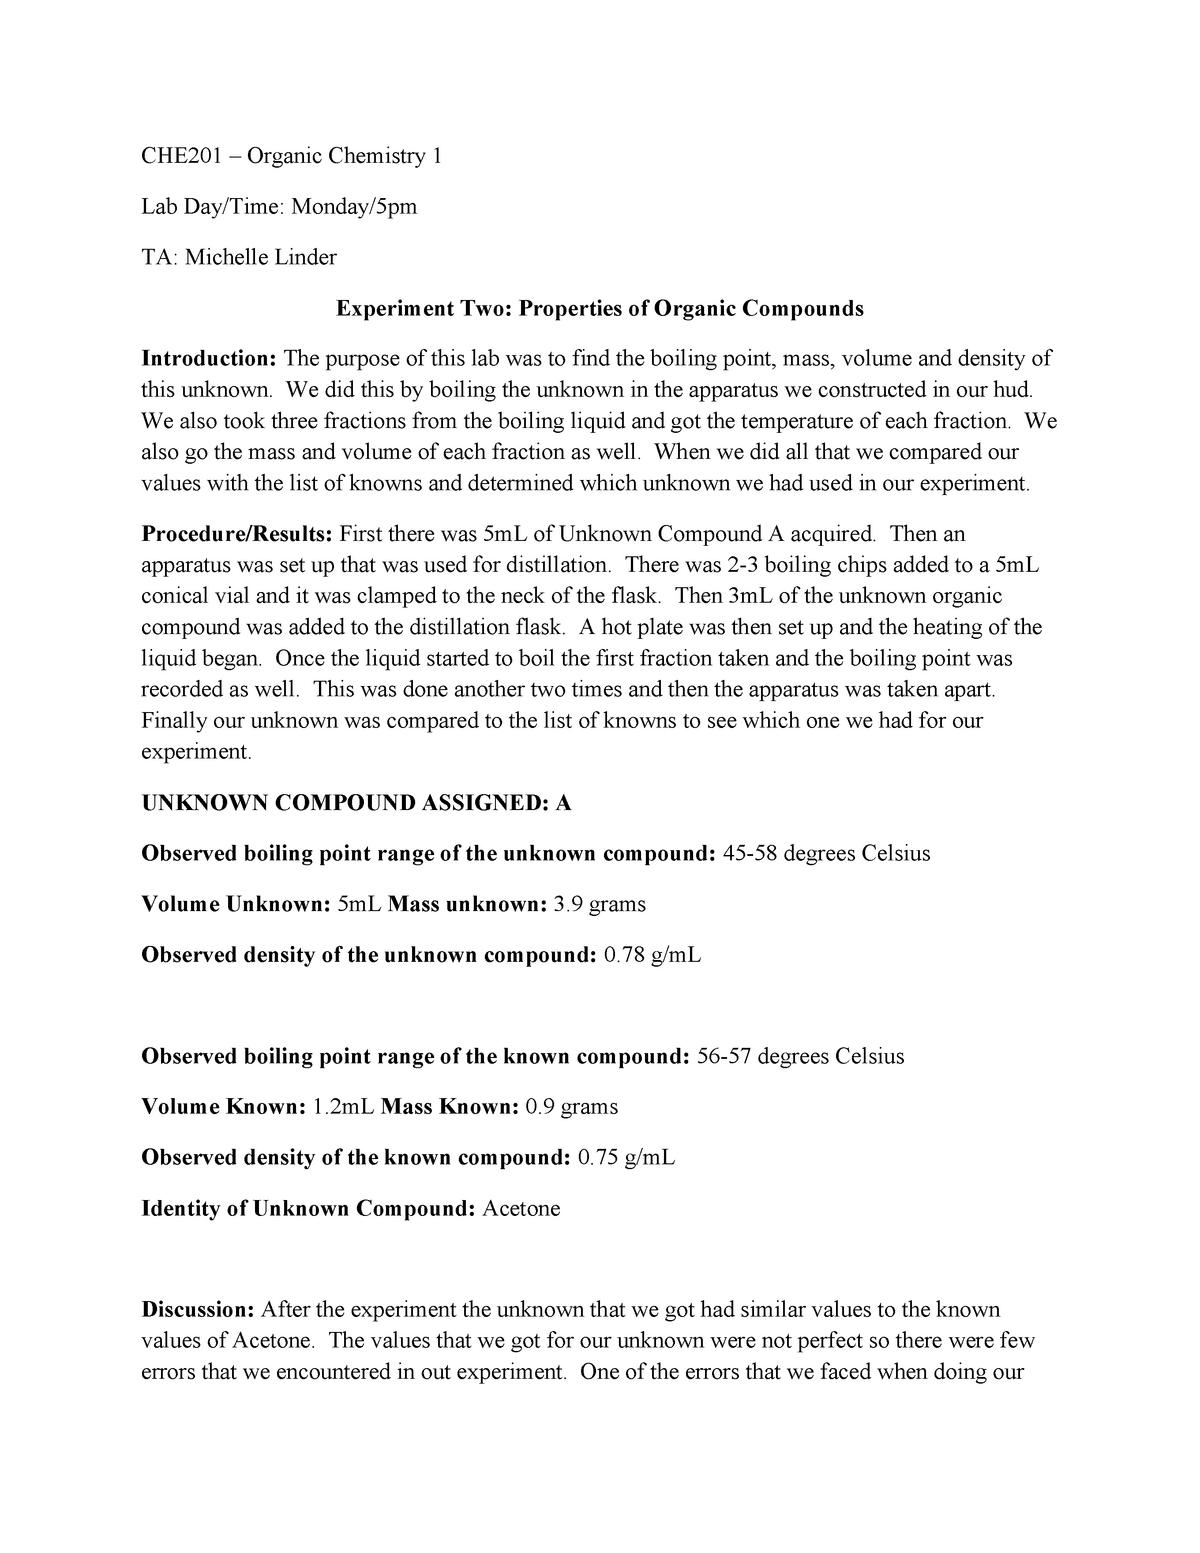 CHE201 Lab Report 2 - CHE 201LBR: Organic Chemistry Lab-Rec - StuDocu